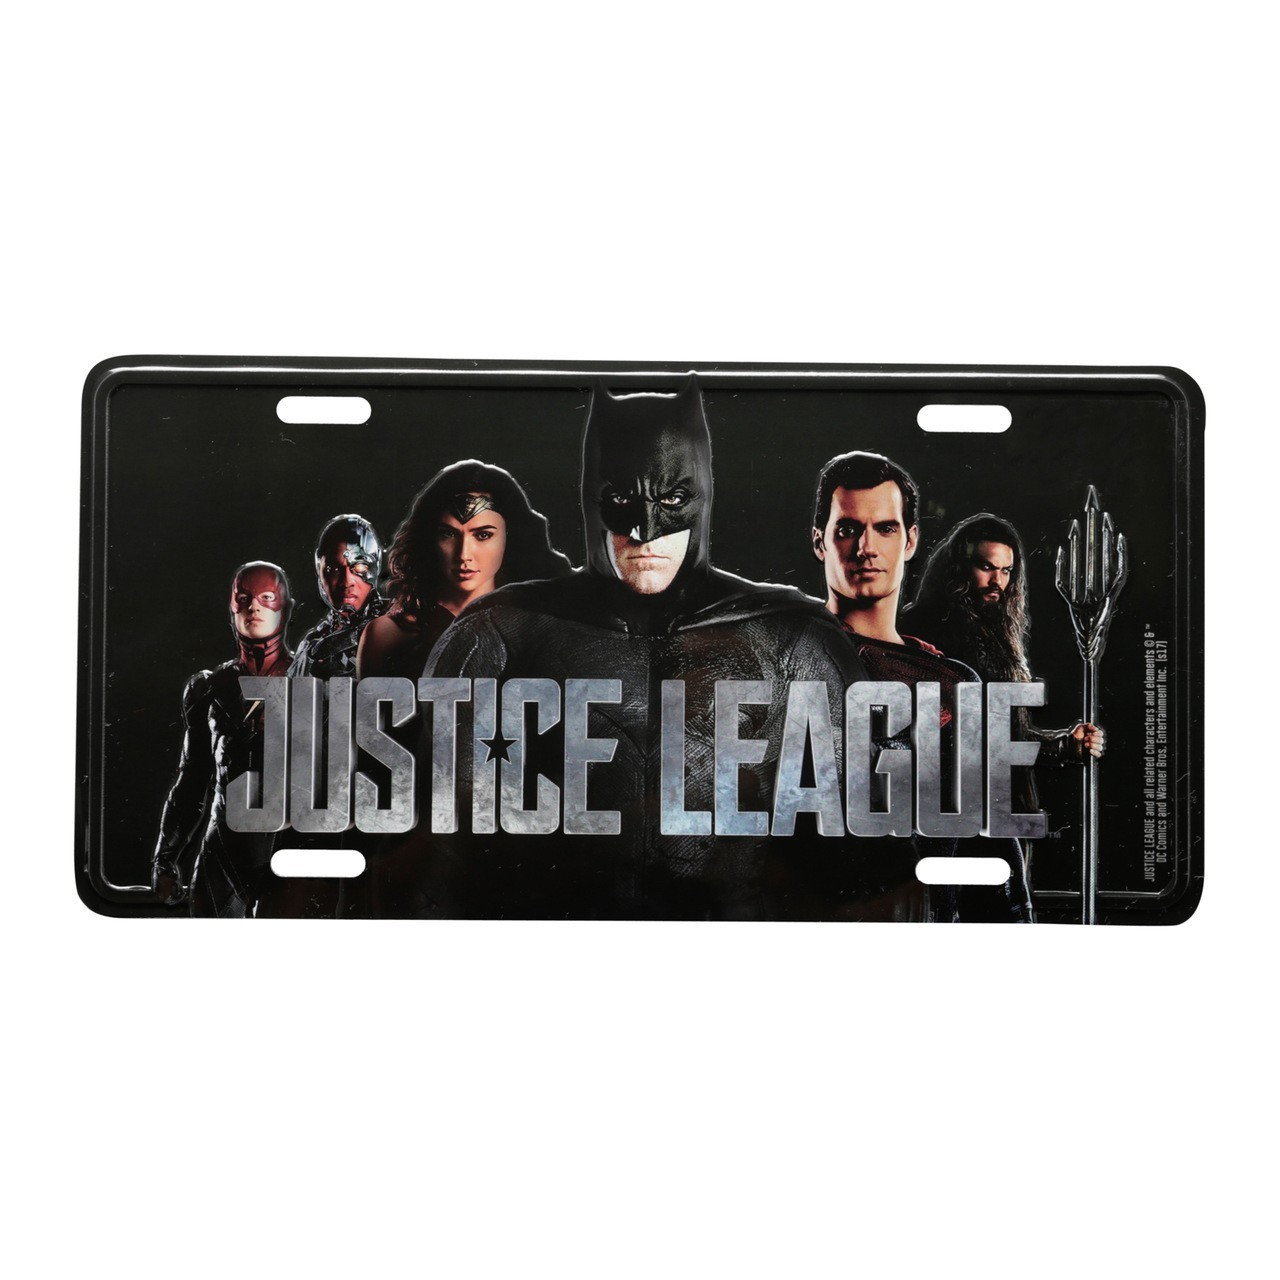 Placa de Carro: Liga da Justiça (Justice League) Dc Comics - Urban